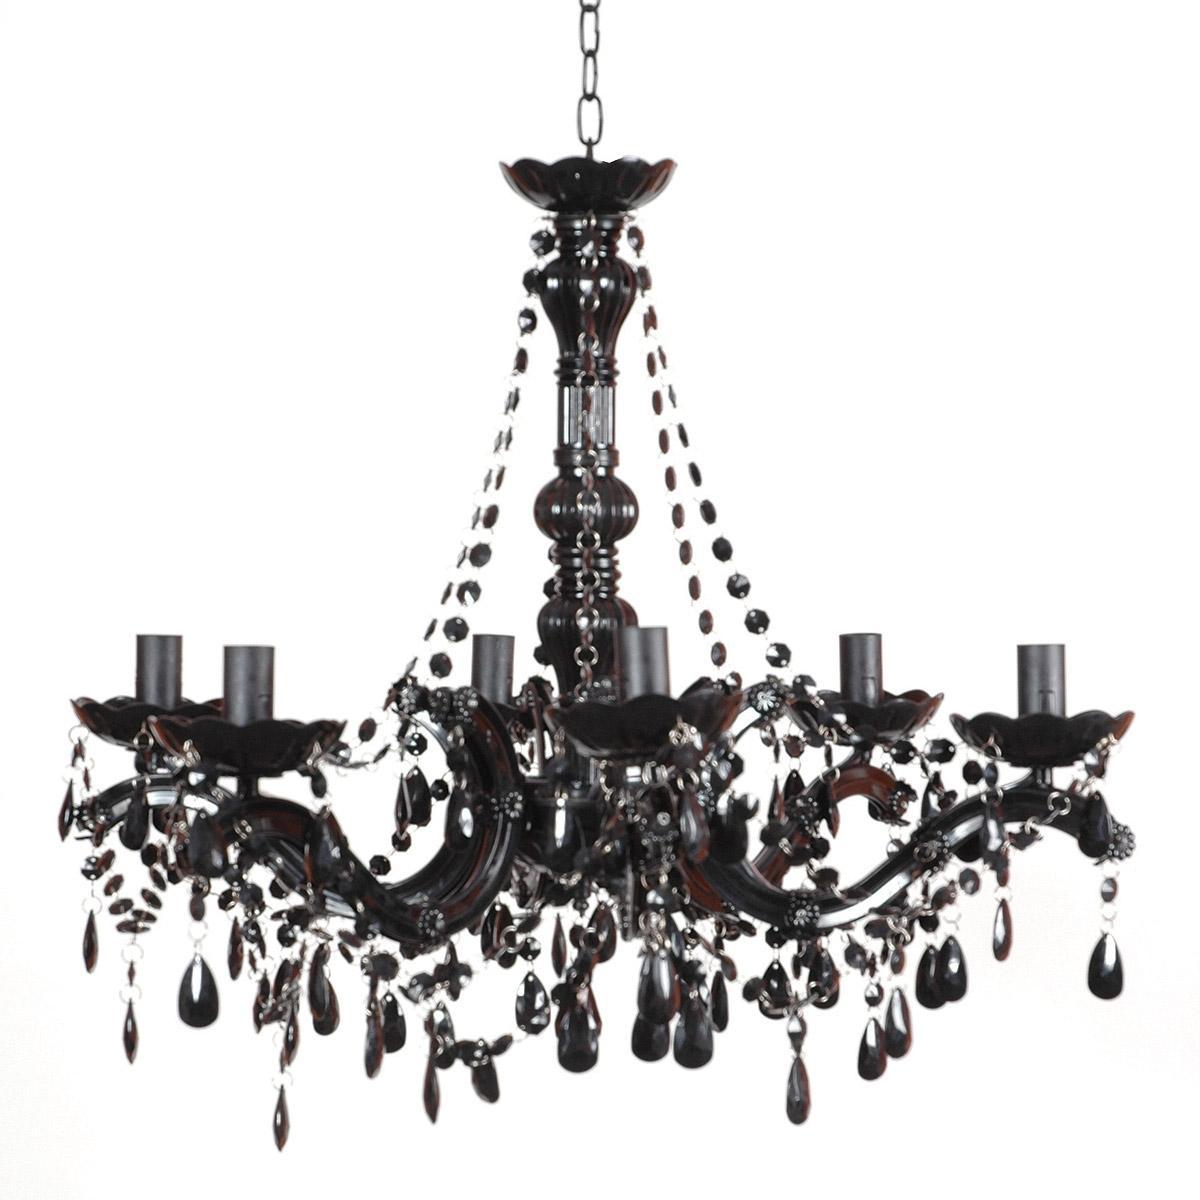 Black Chandeliers For And Chandelier Bedroom Modern Crystal Home For Antique Black Chandelier (#4 of 12)